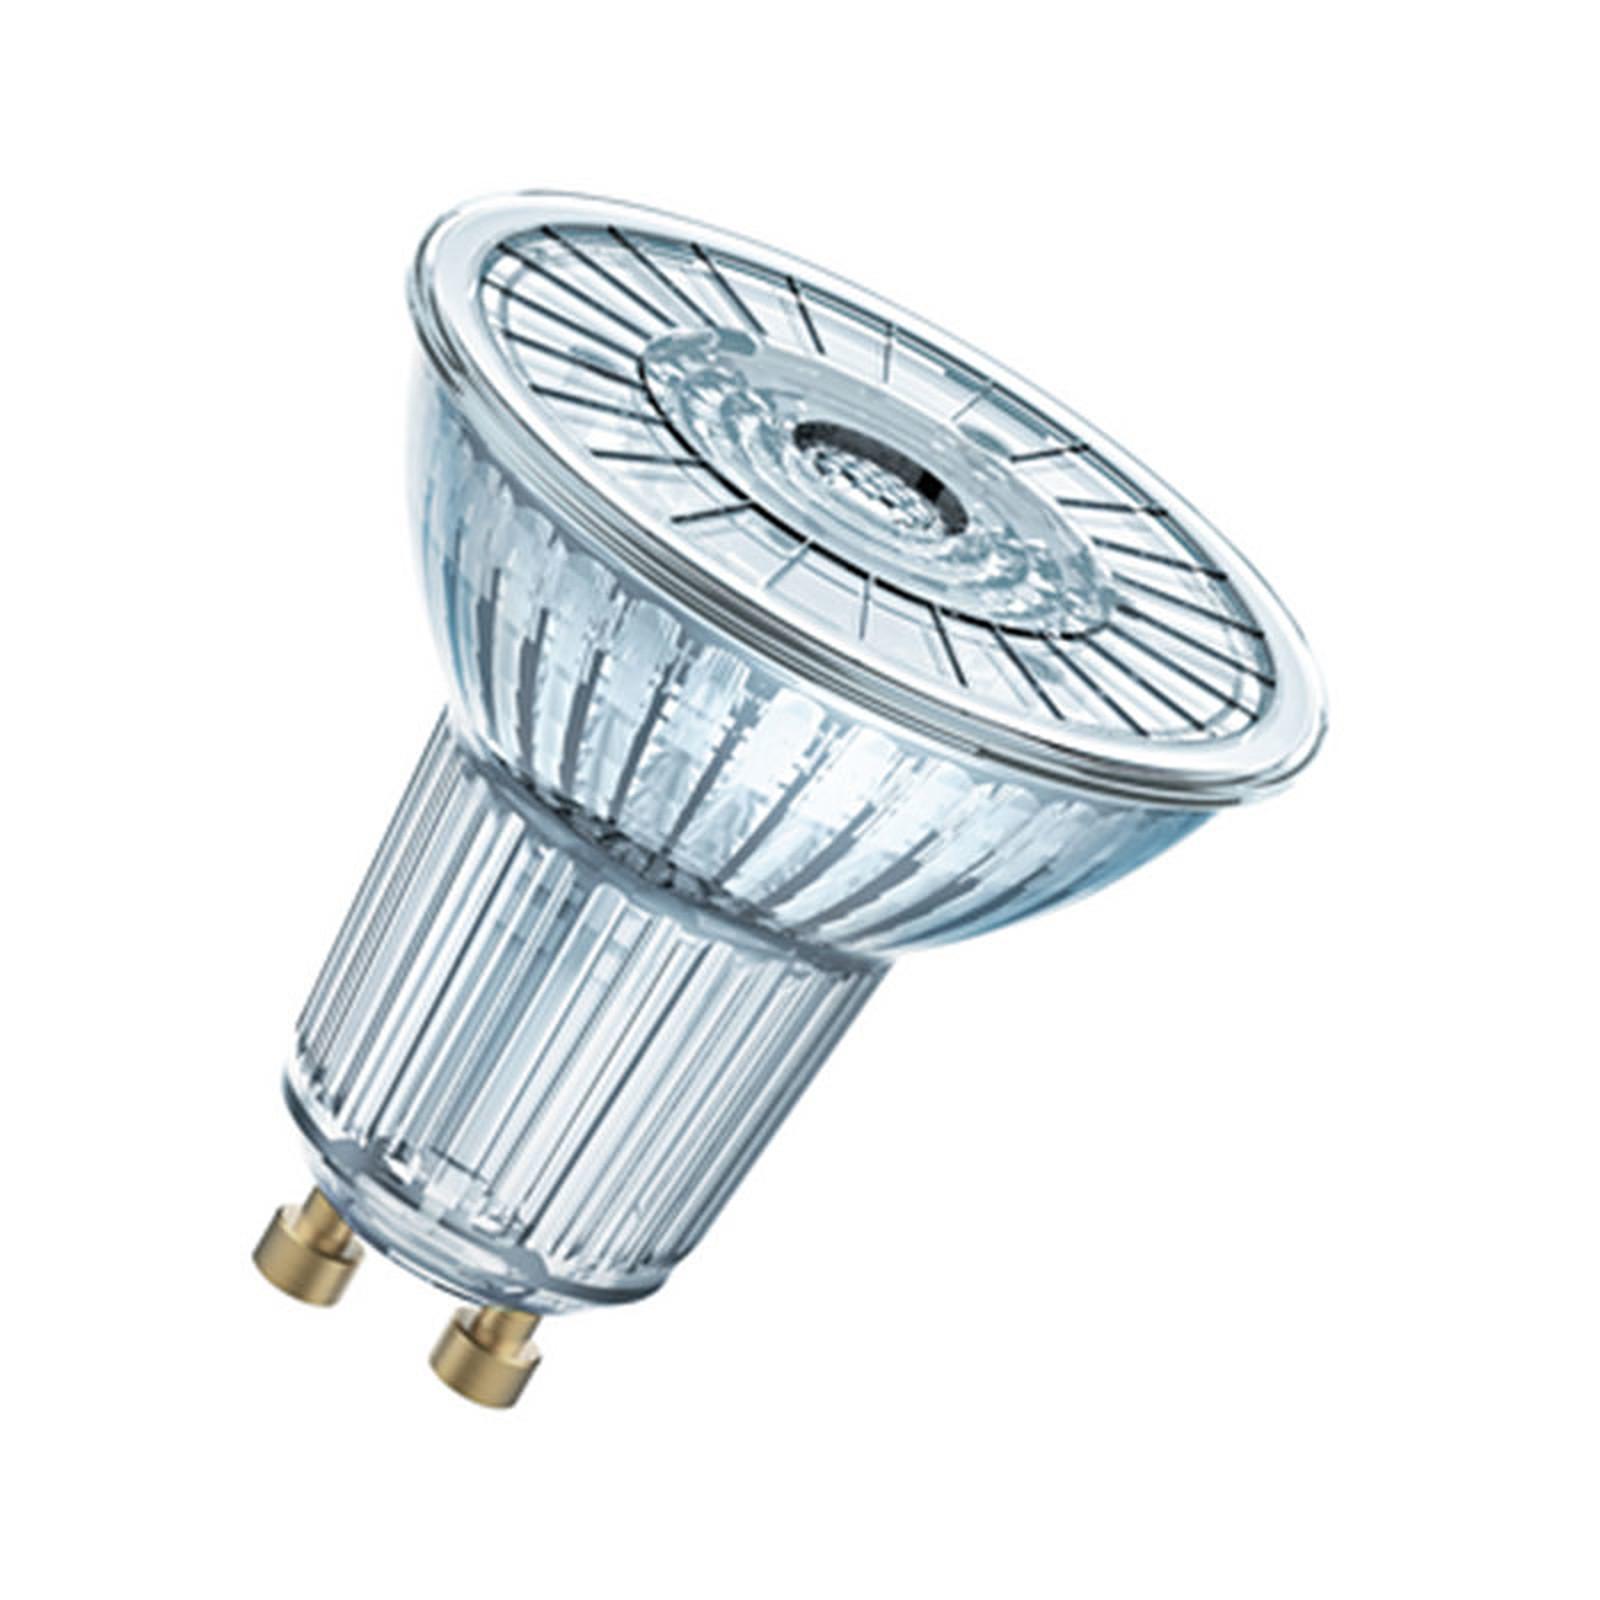 OSRAM Ampoule LED Superstar spot GU10 4.6W (50W) A+